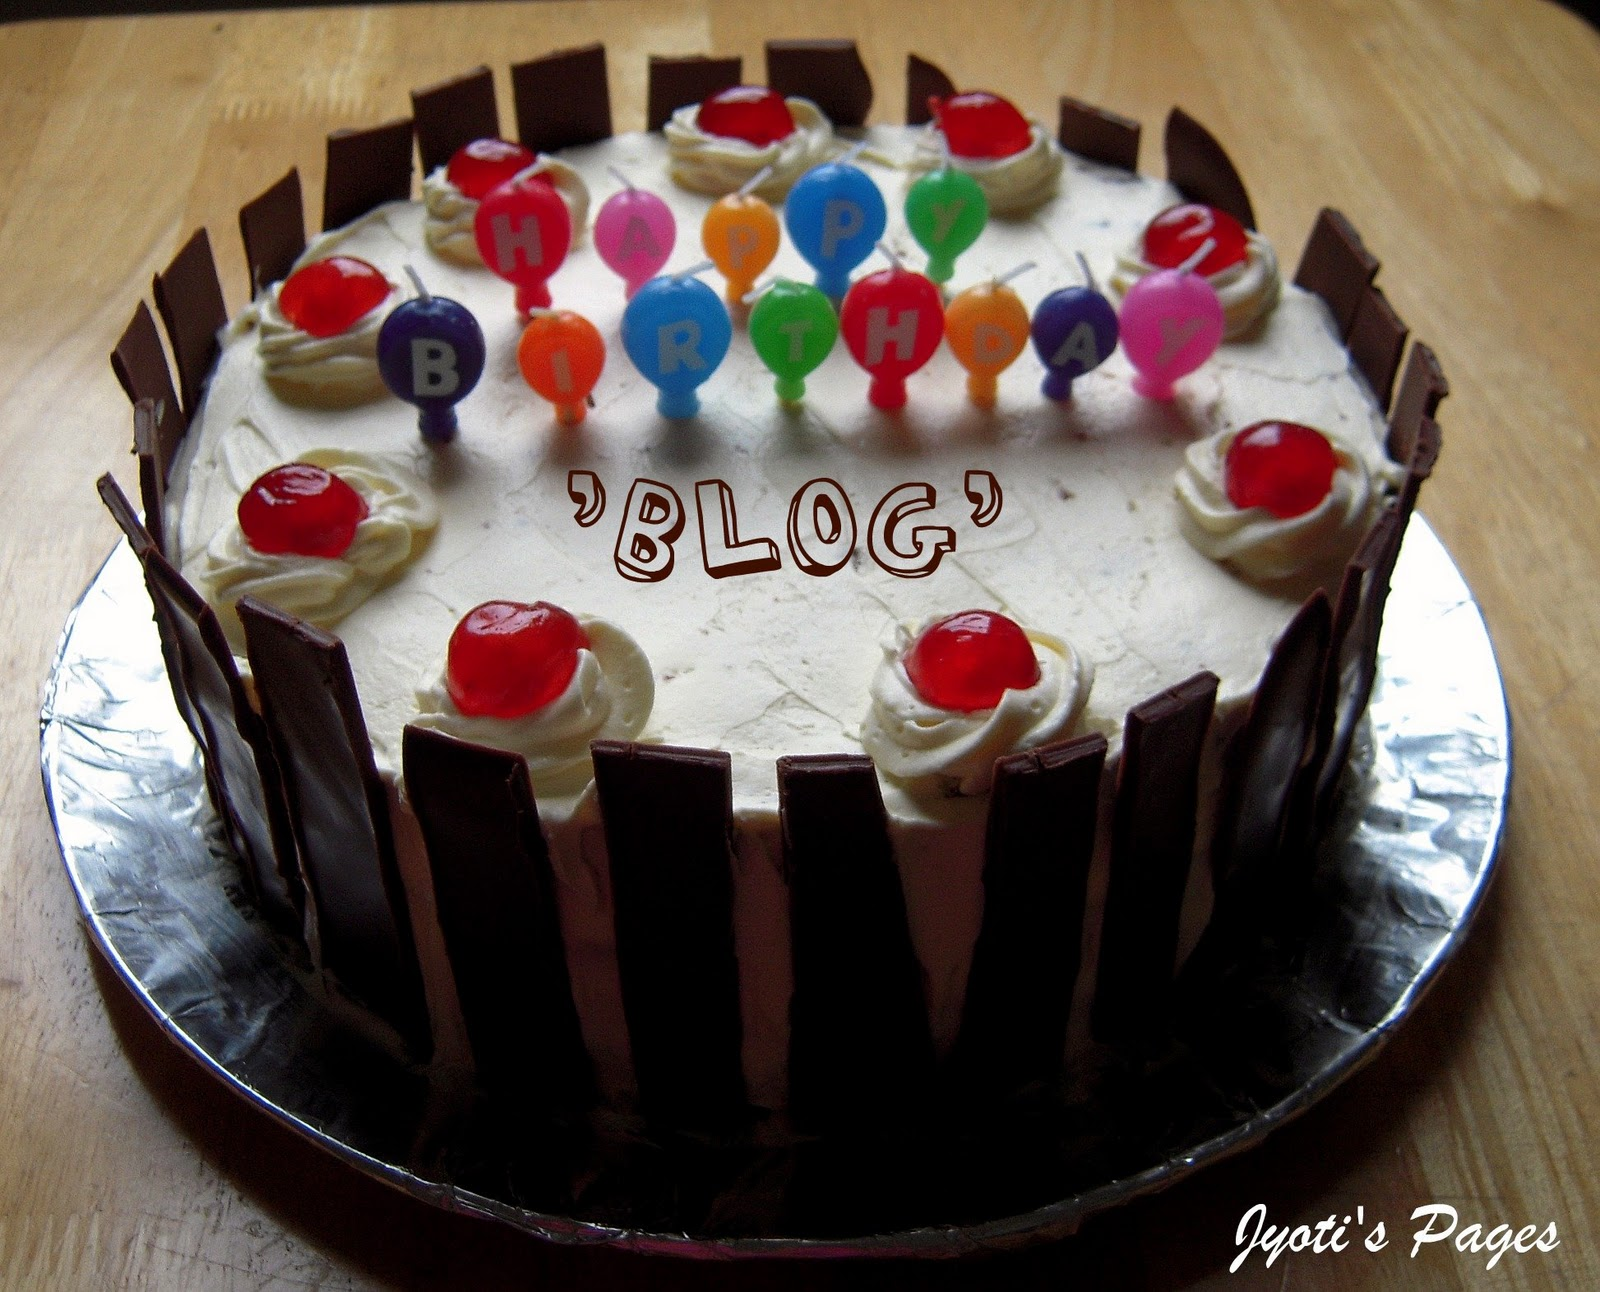 Happy Birthday Jyoti Cake Ideas and Designs